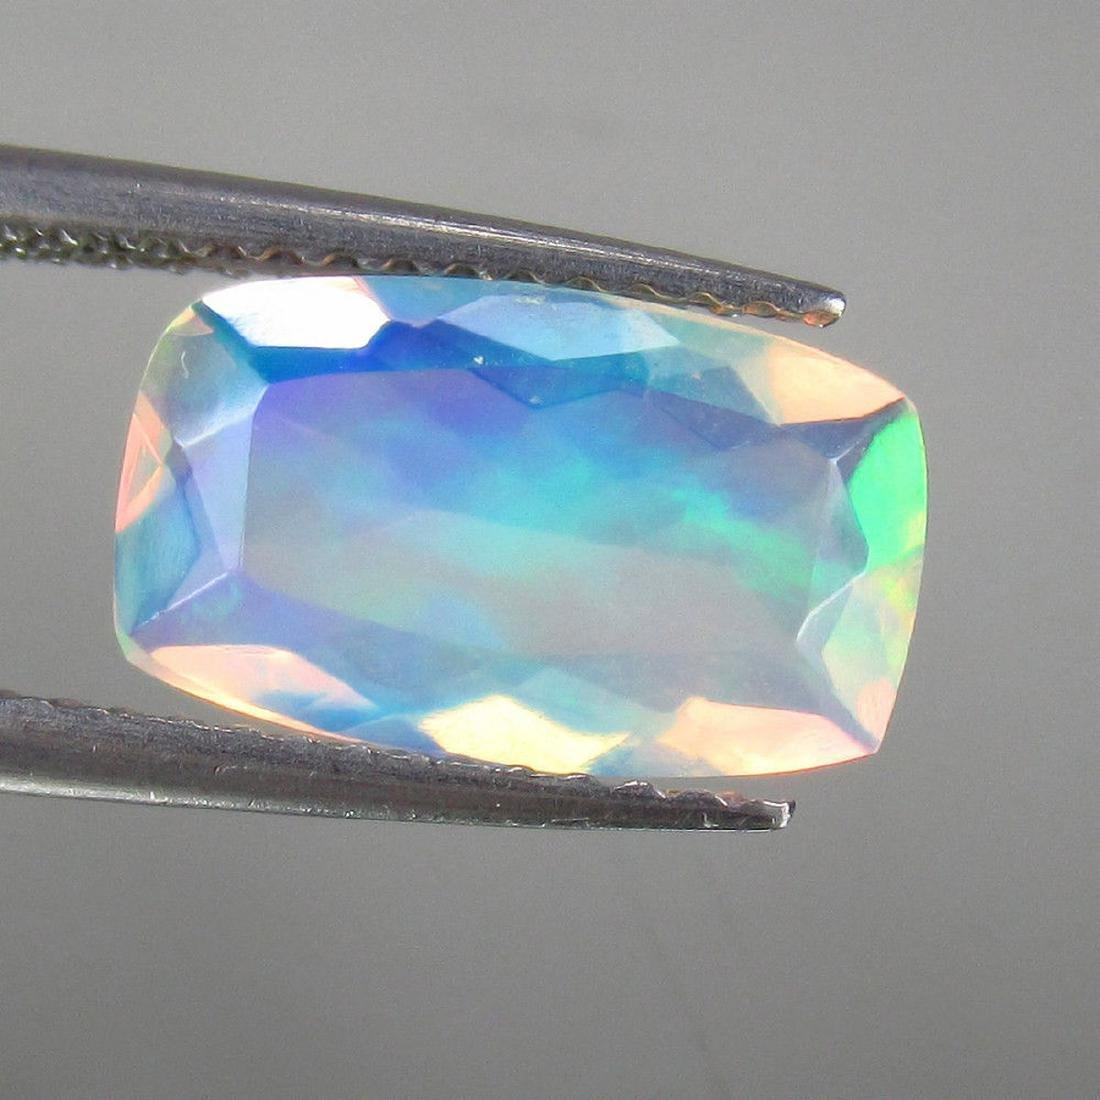 1.52 Carat Natural Loose Ethiopian Faceted Welo Opal